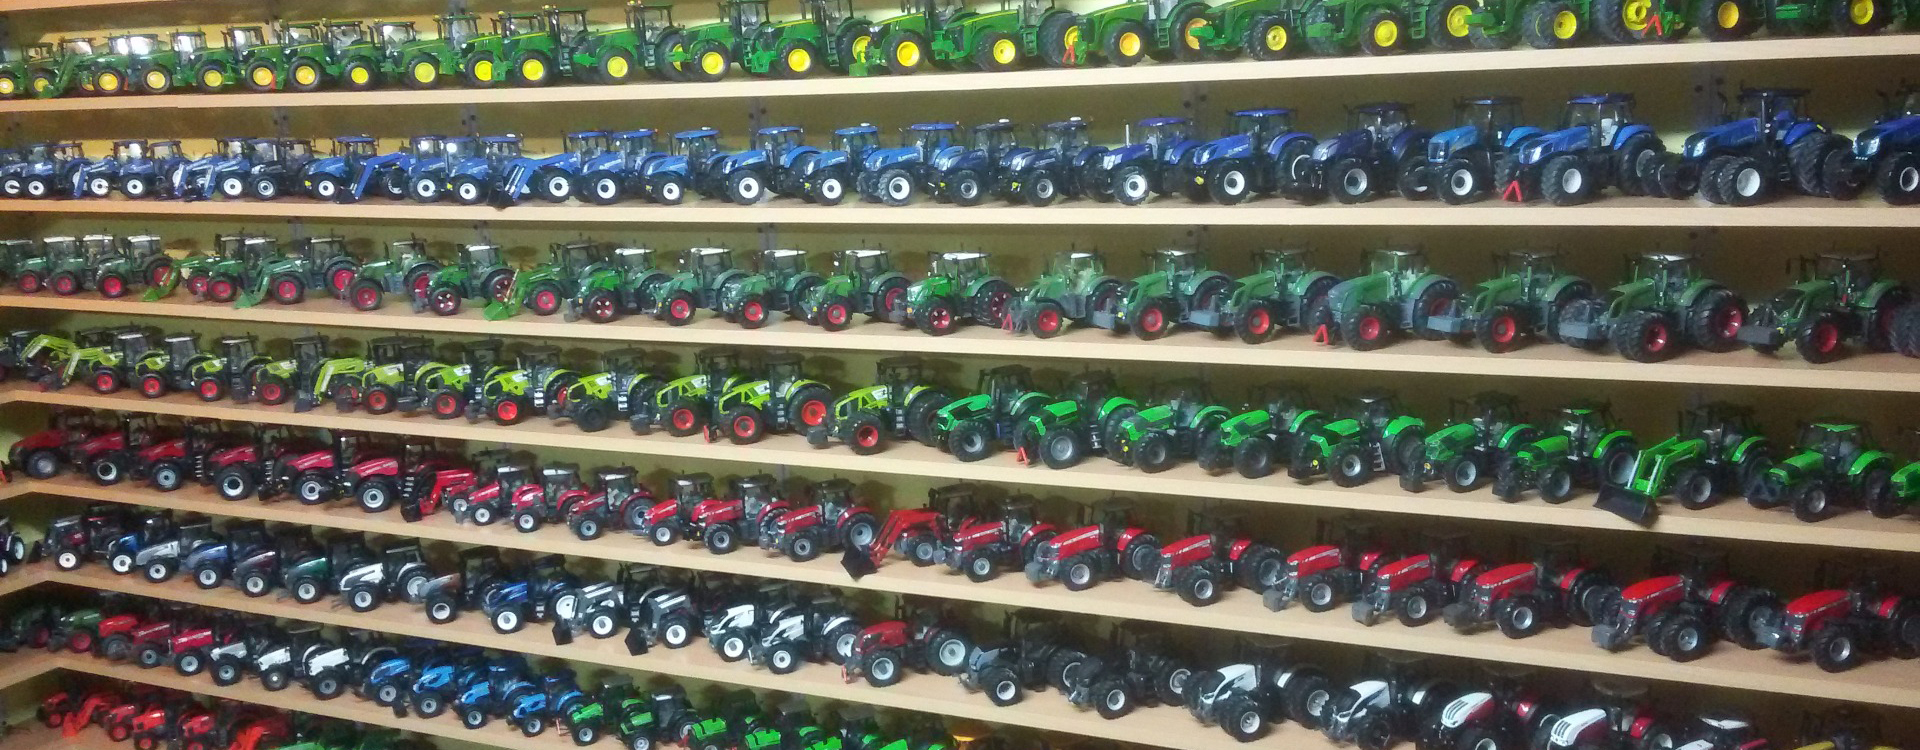 Modele rolnicze - pasja kolekcjoner